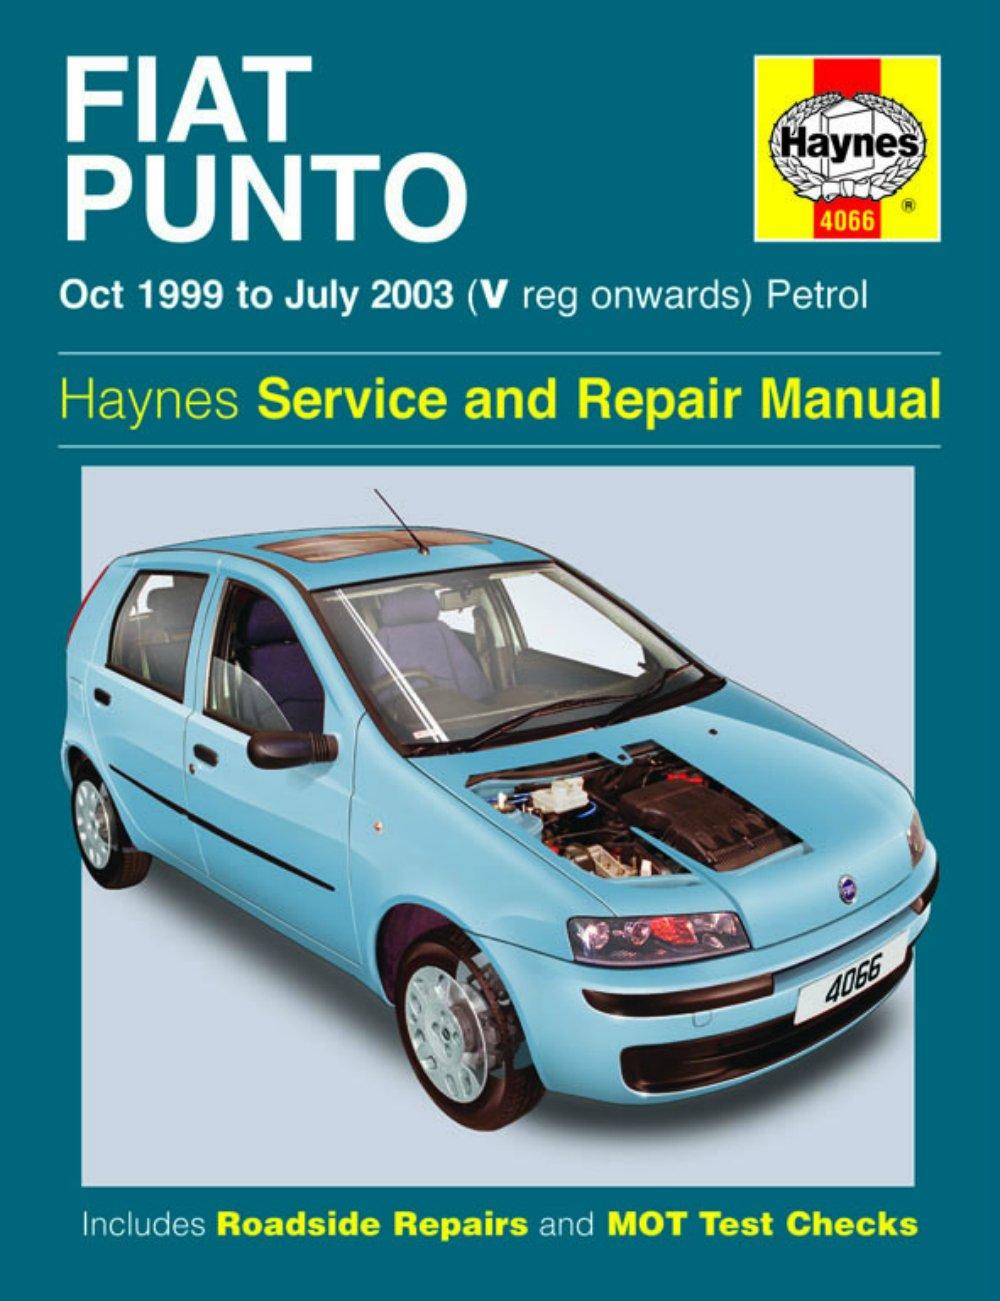 Haynes Fiat Punto Petrol (Oct 99 - July 03) V reg onwards Car Maintenance  Service Repair Manuals HAYNES MANUAL MANUALS 4066: Amazon.co.uk: Car &  Motorbike